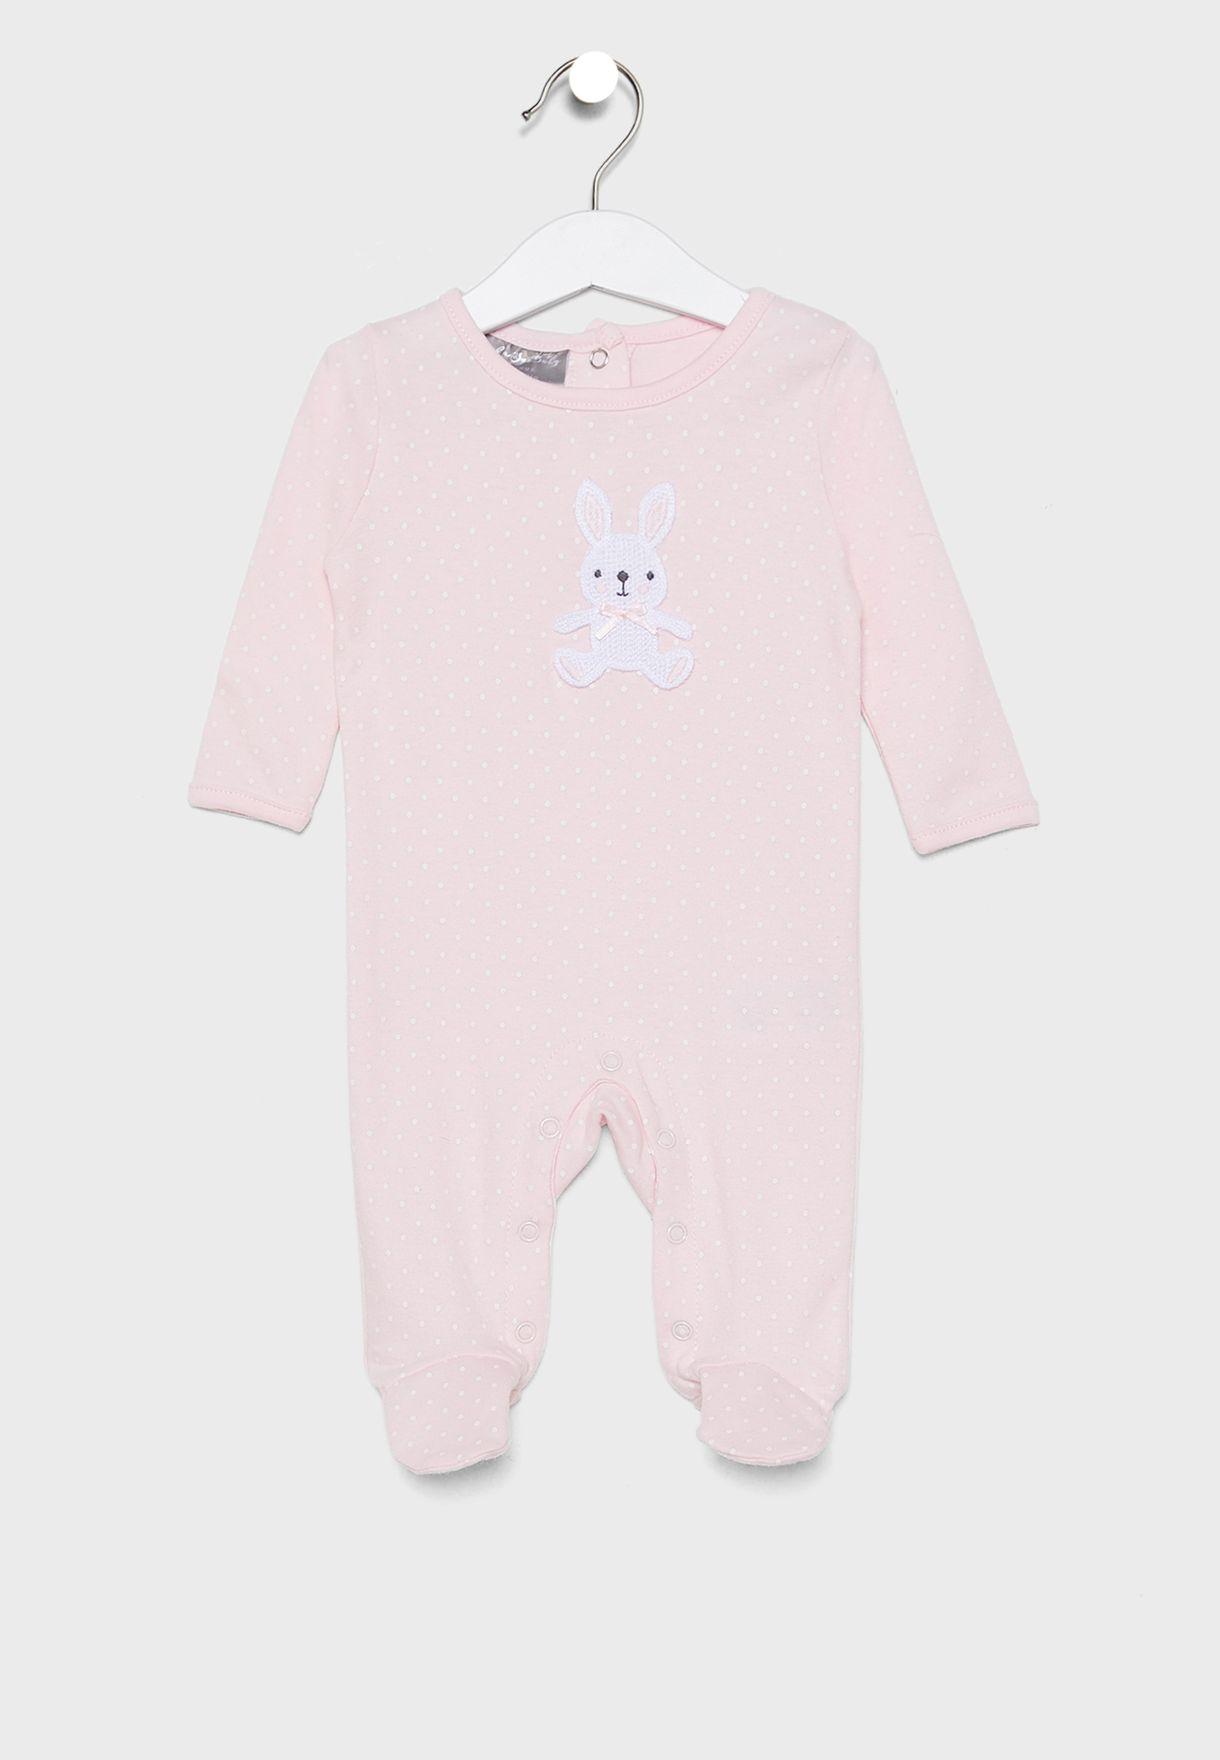 Infant Bunny Romper